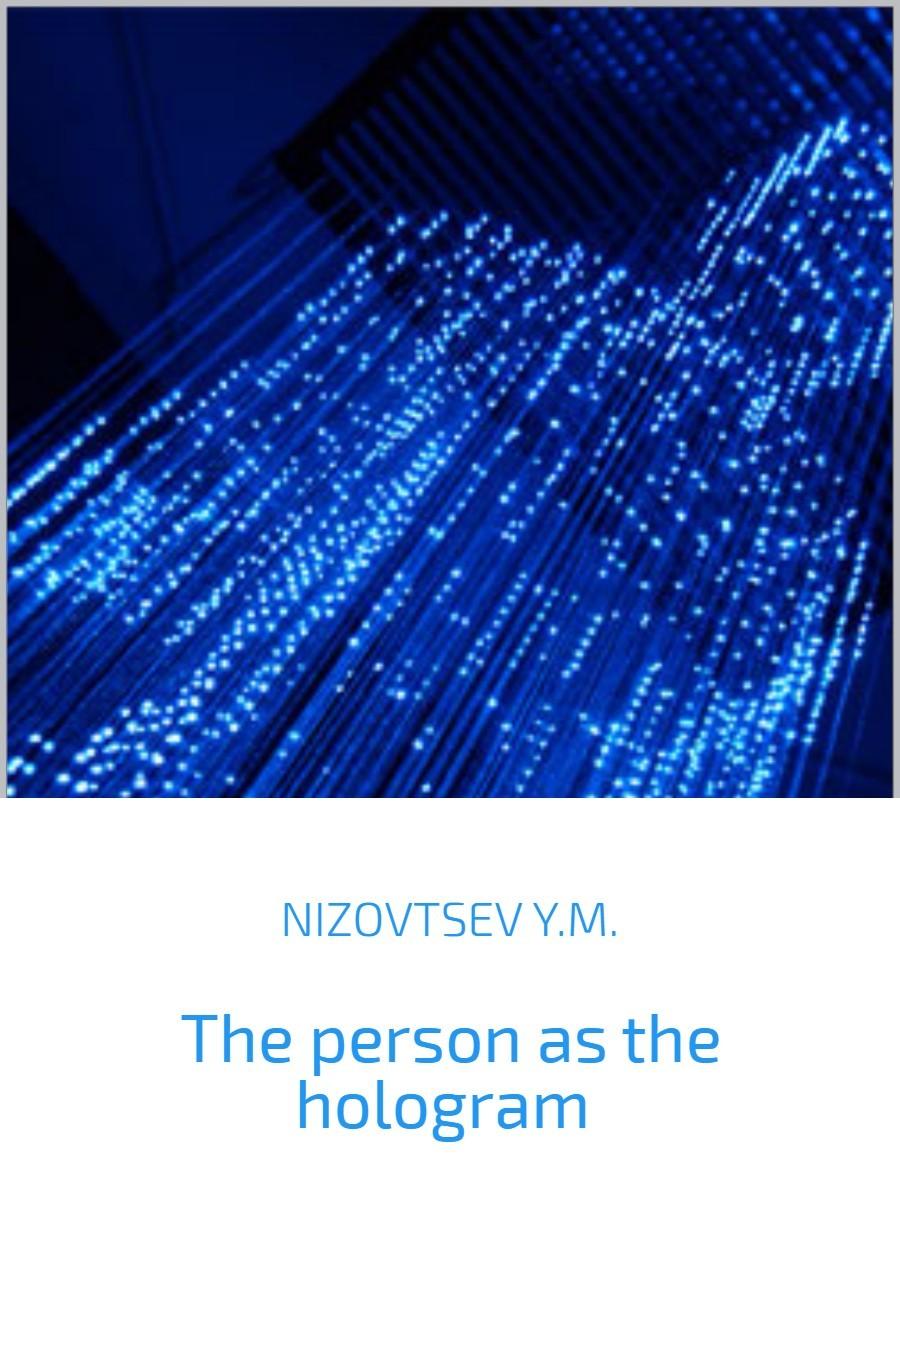 купить Юрий Михайлович Низовцев The person as the hologram по цене 99.9 рублей